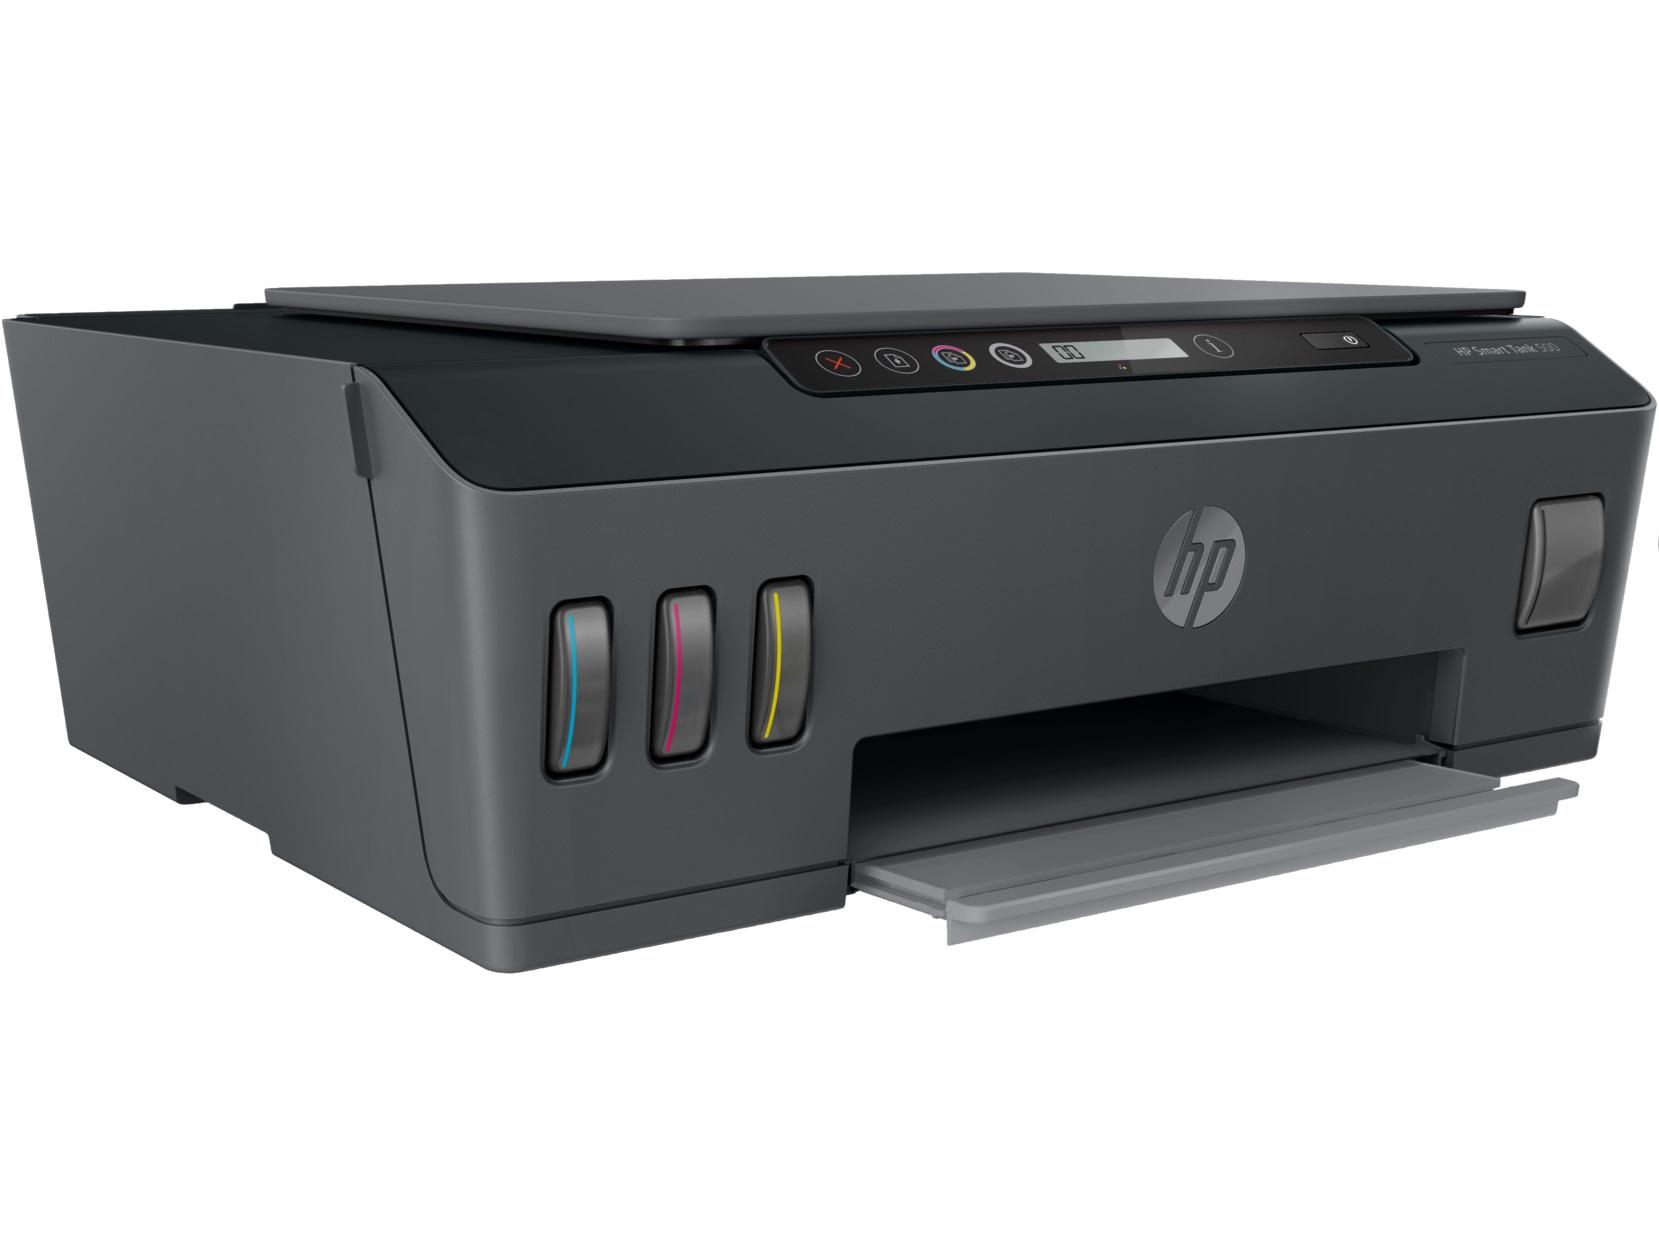 MFD CISS HP Smart Tank 500, Black/Gray, A4, up to 11ppm/5ppm black/color, up to 4800x1200 dpi,  Scan 1200 x 1200, Up to 800 p/m, 800Mhz, 256 Mb, 7 segment LCD, Hi-Speed USB 2.0, (3*GT53XL Black 135ml, 1*GT52 C/M/Y)